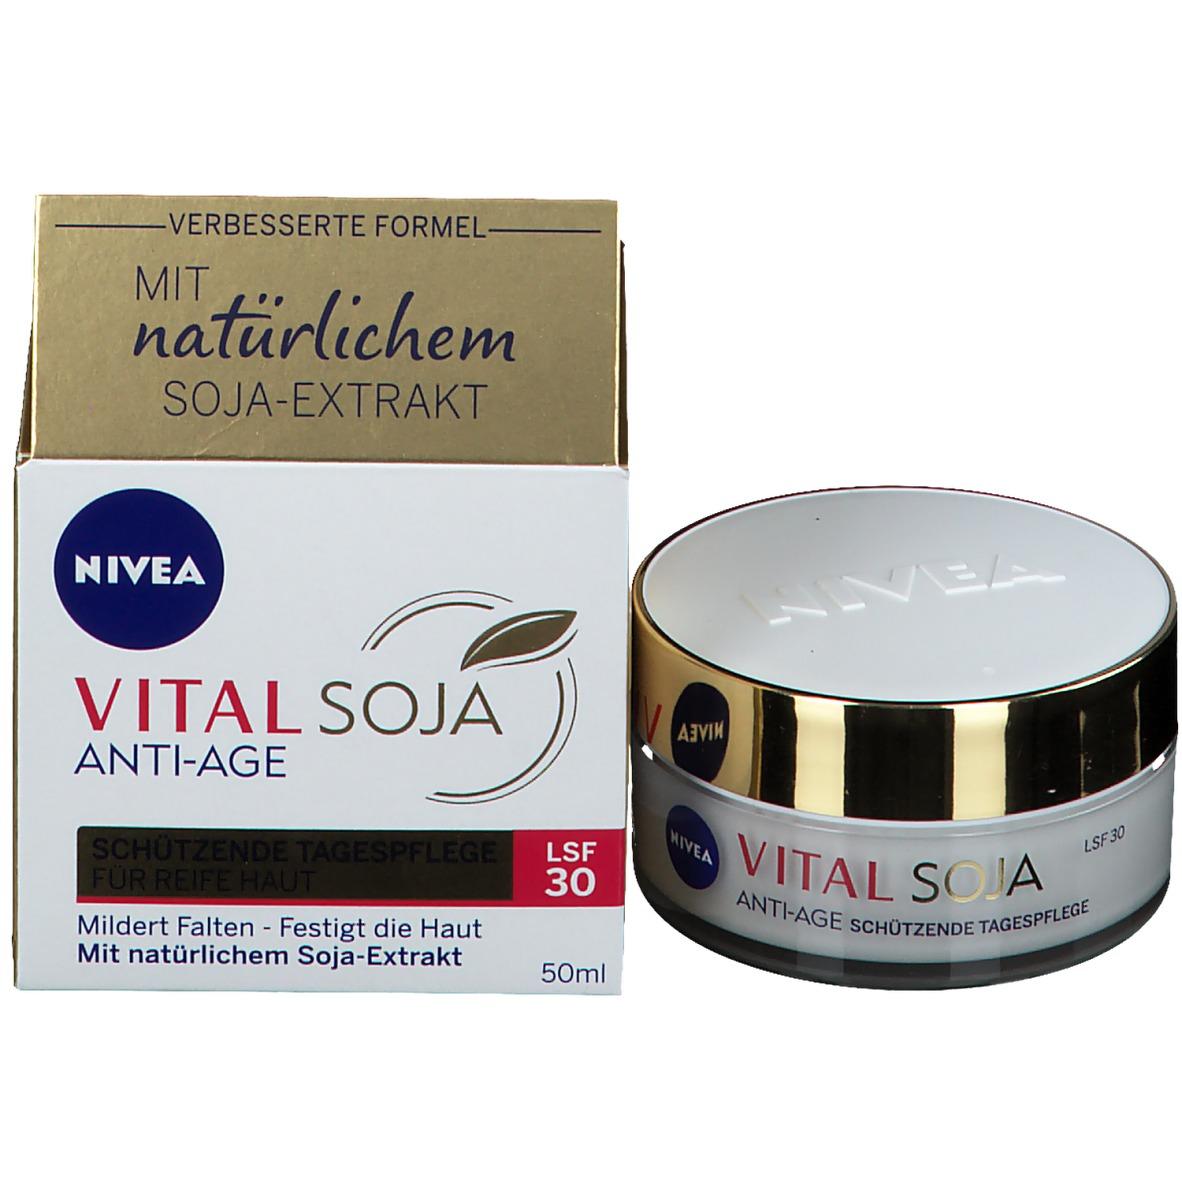 NIVEA® VITAL Soja Anti Age Schützende Tagespflege LSF 30..